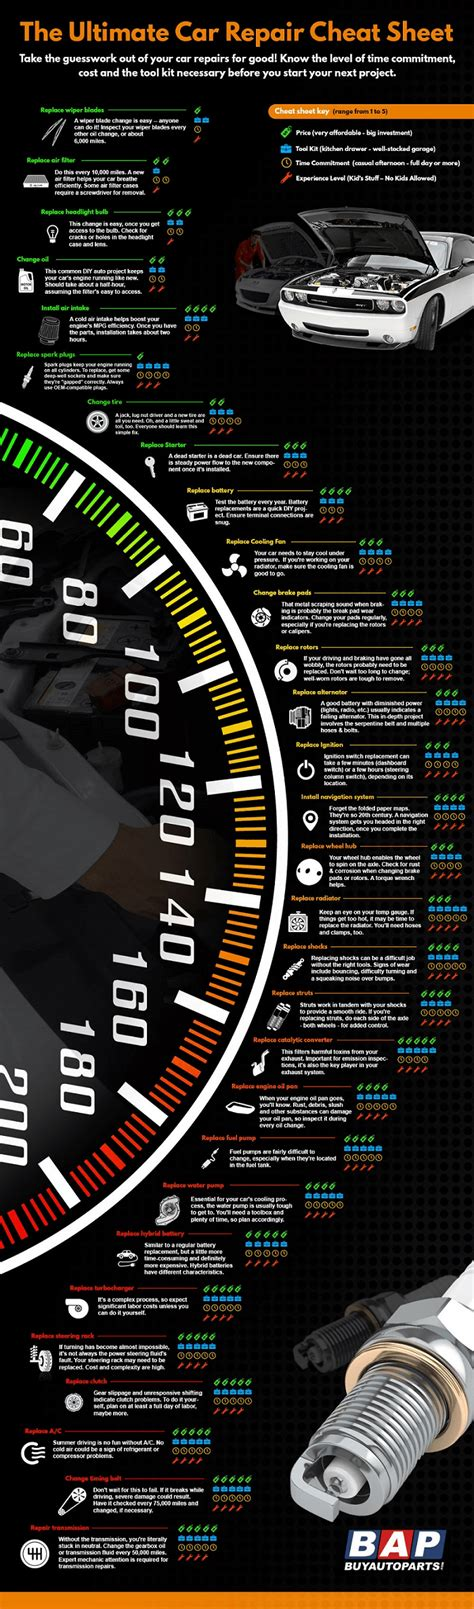 Infographic: The Ultimate Car Repair Cheat Sheet